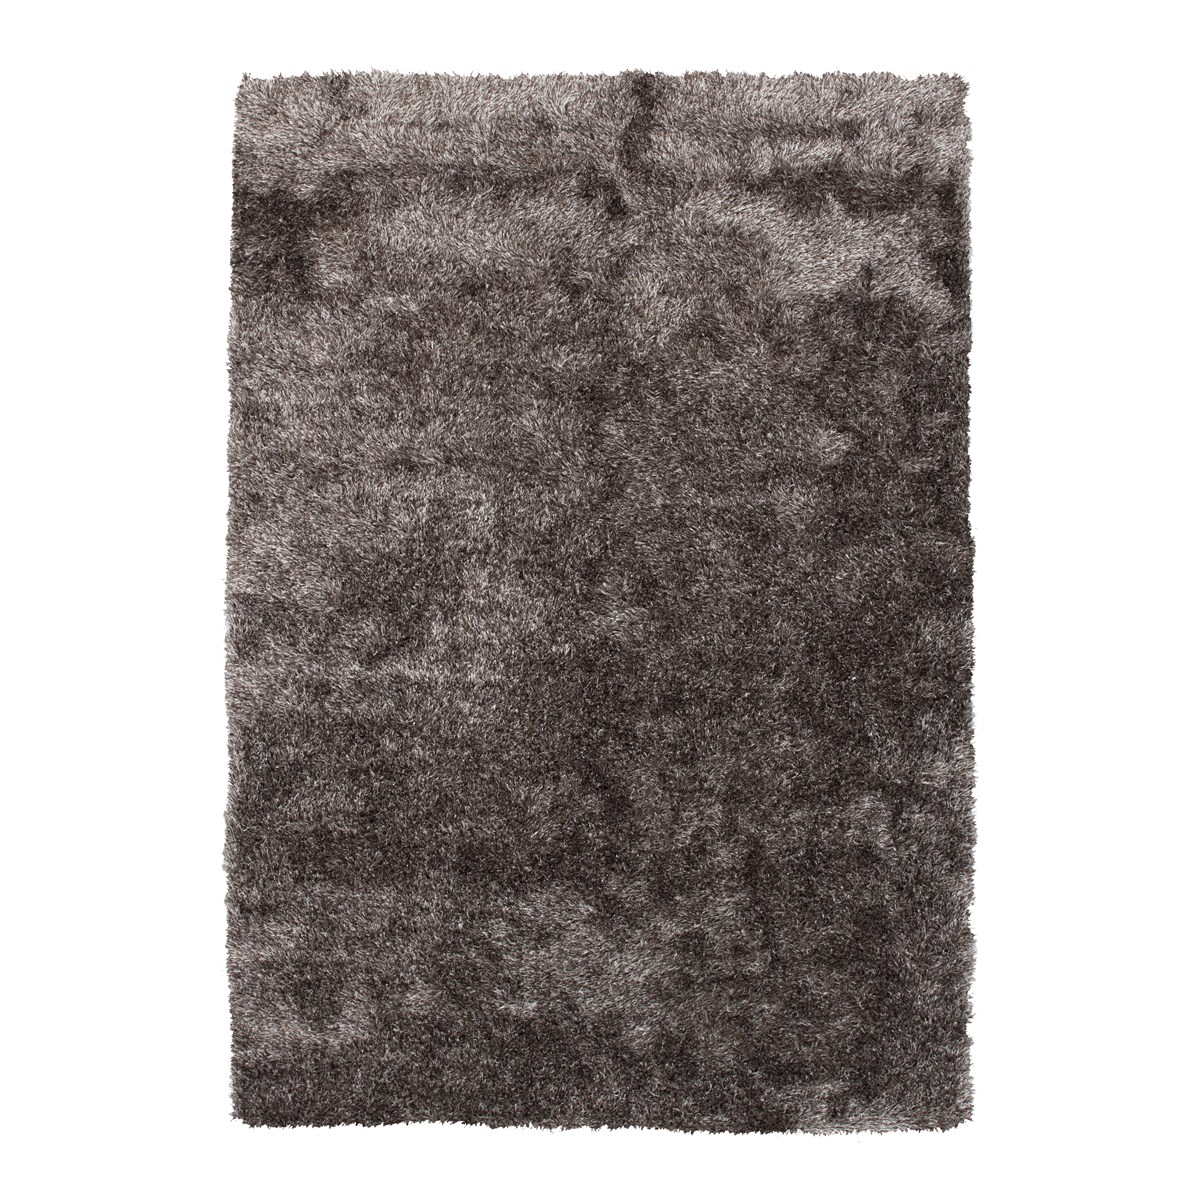 Tapis shaggy en Polyester Gris anthracite 160x160 cm